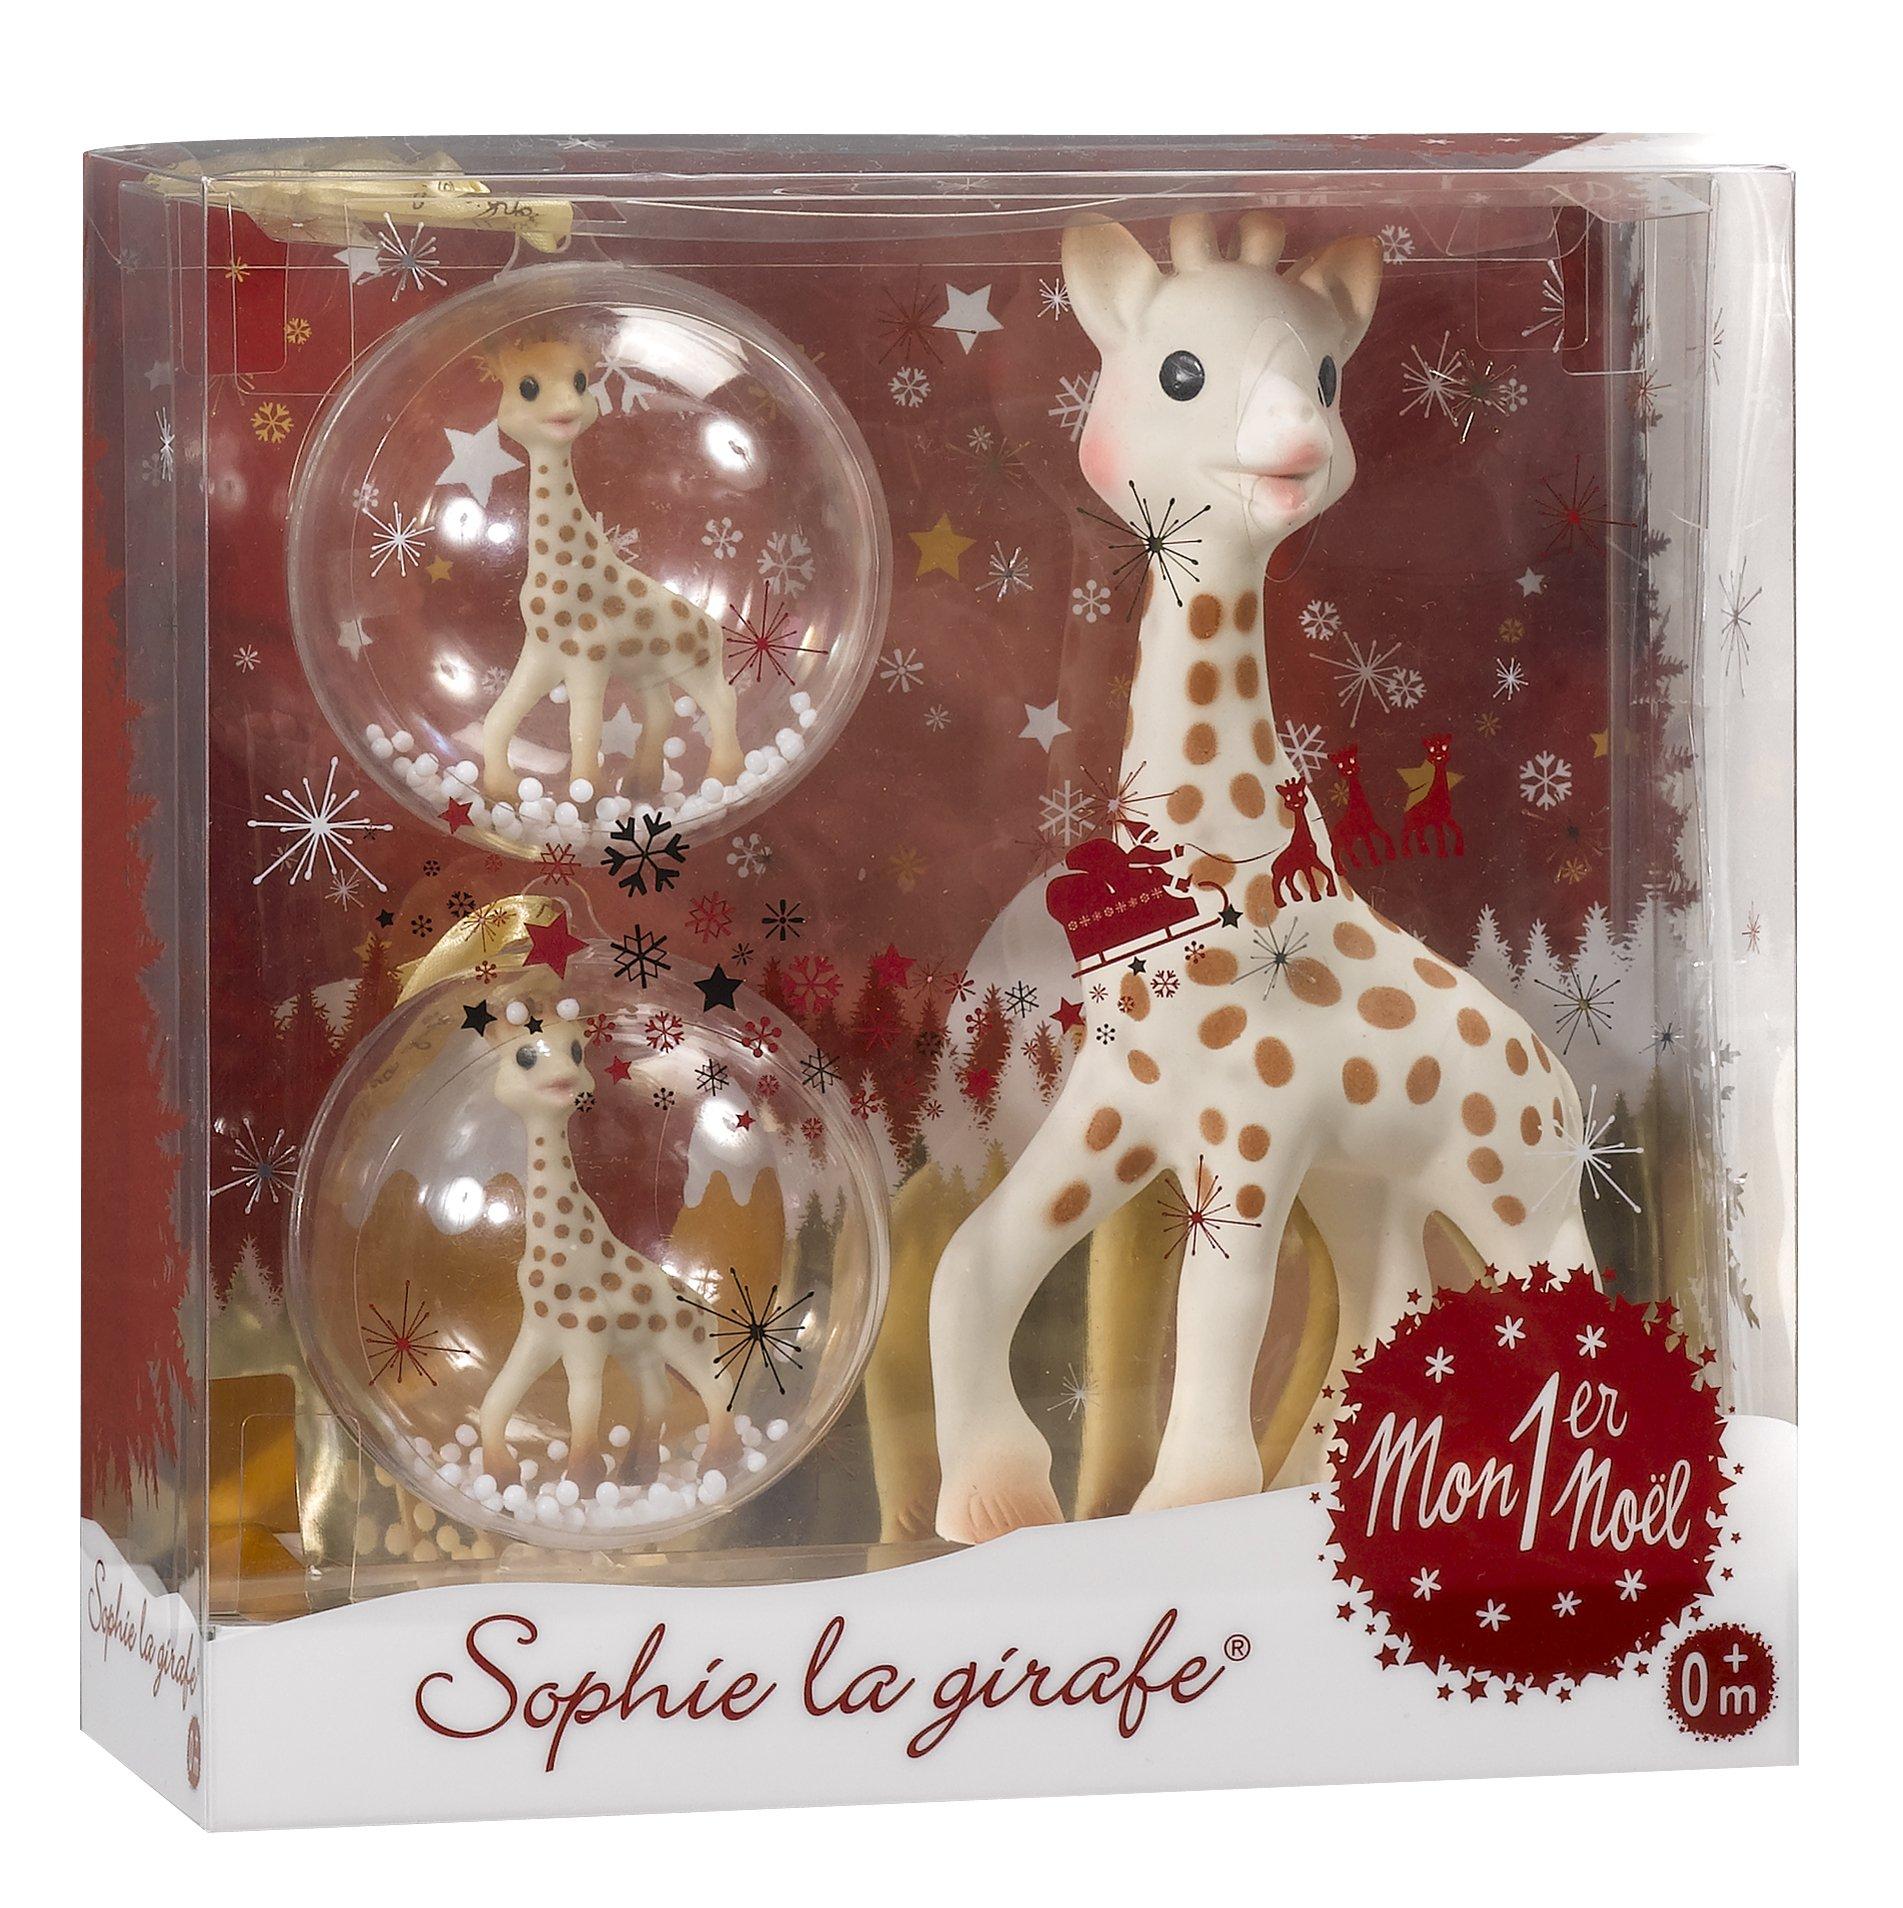 Sophie la Girafe My First Christmas Teether Gift Set by Sophie La Girafe